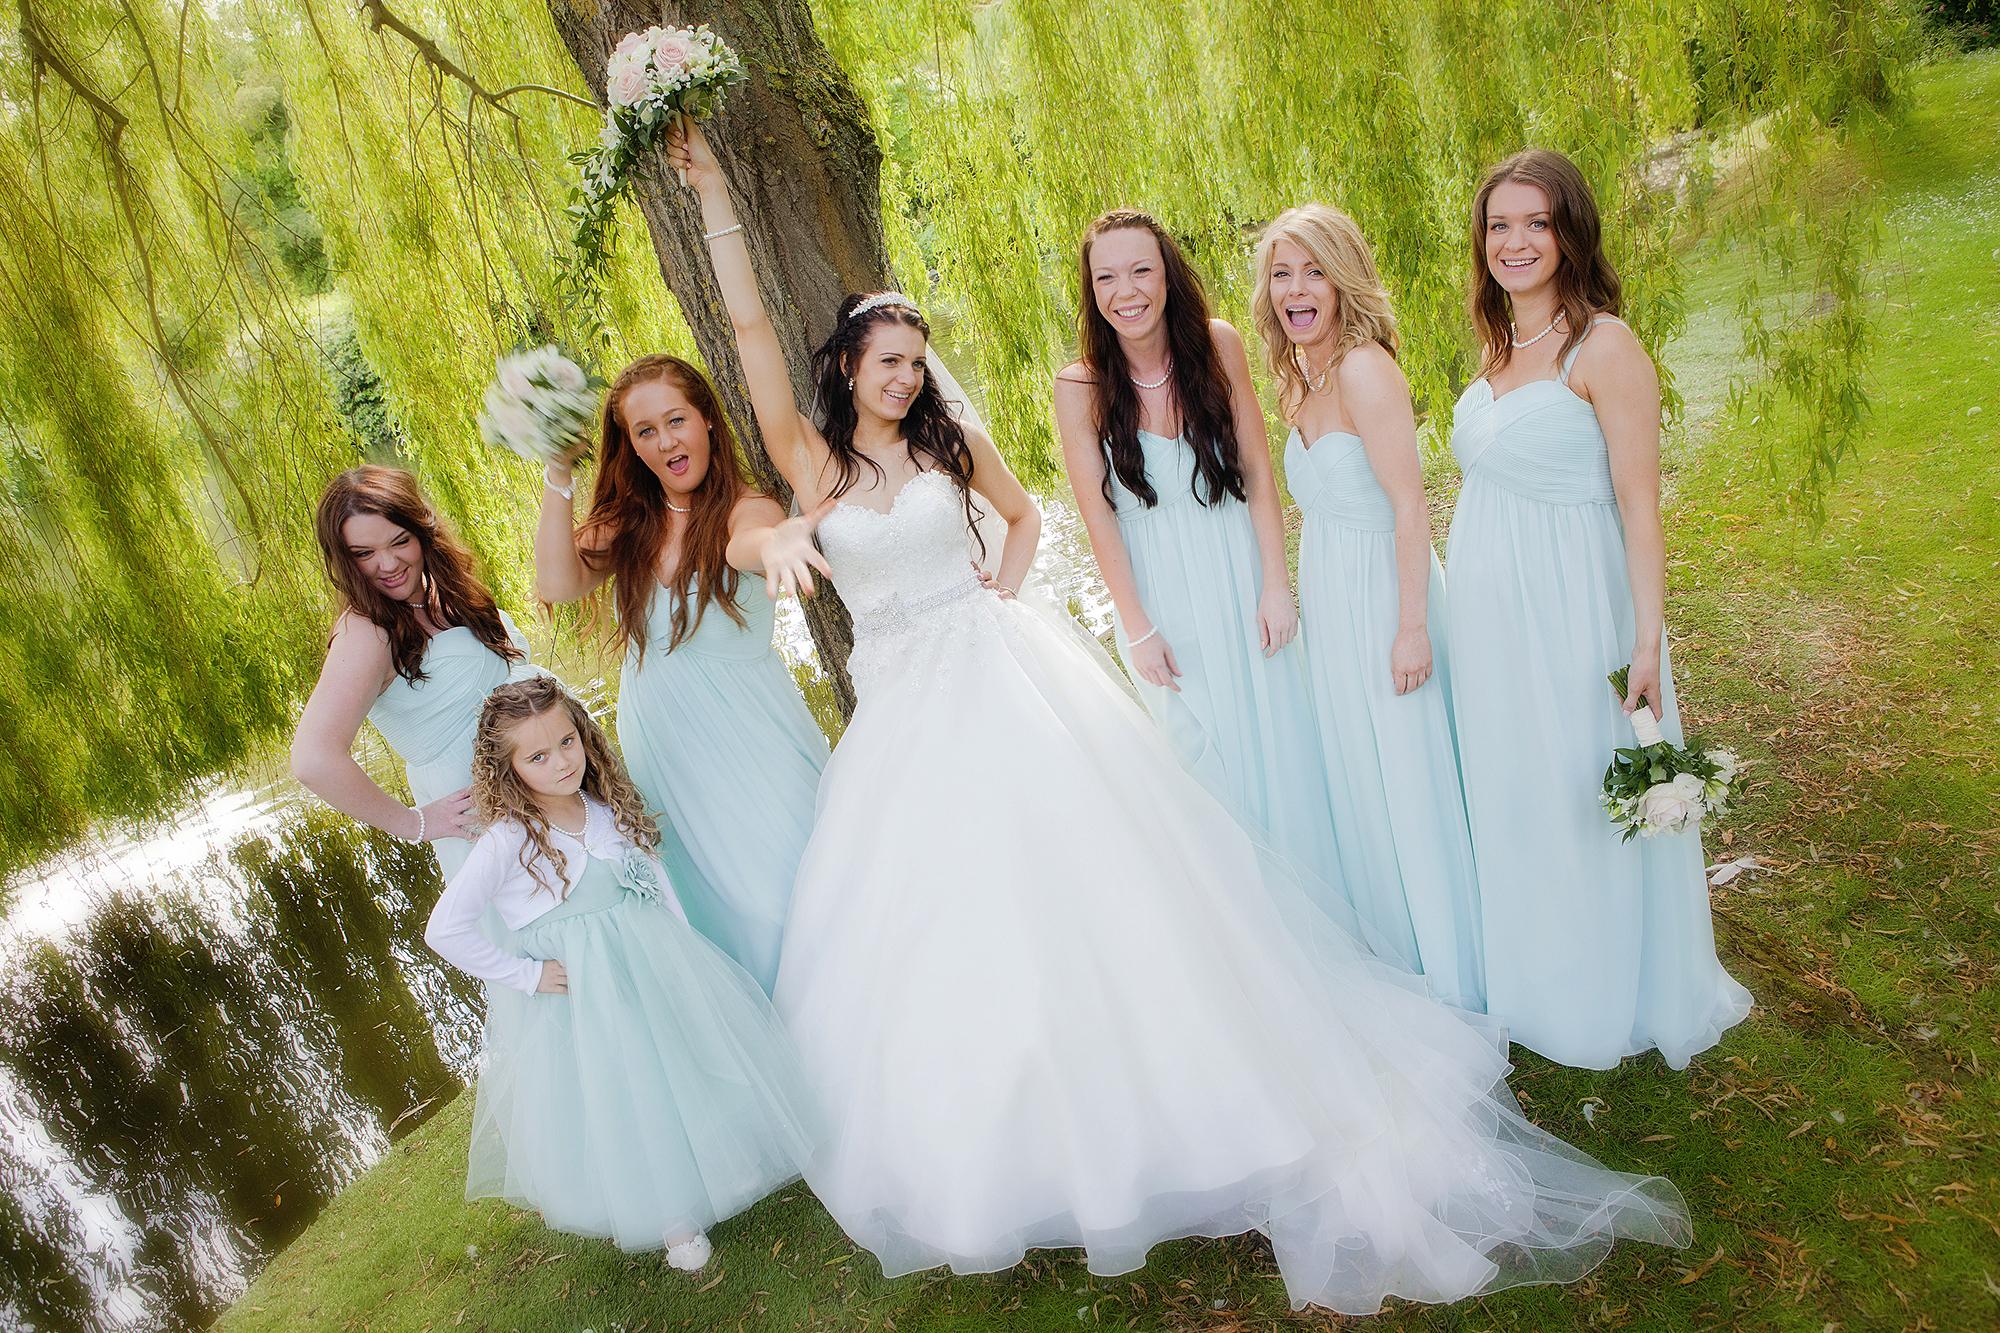 How not to ruin your wedding photos 3.jpg